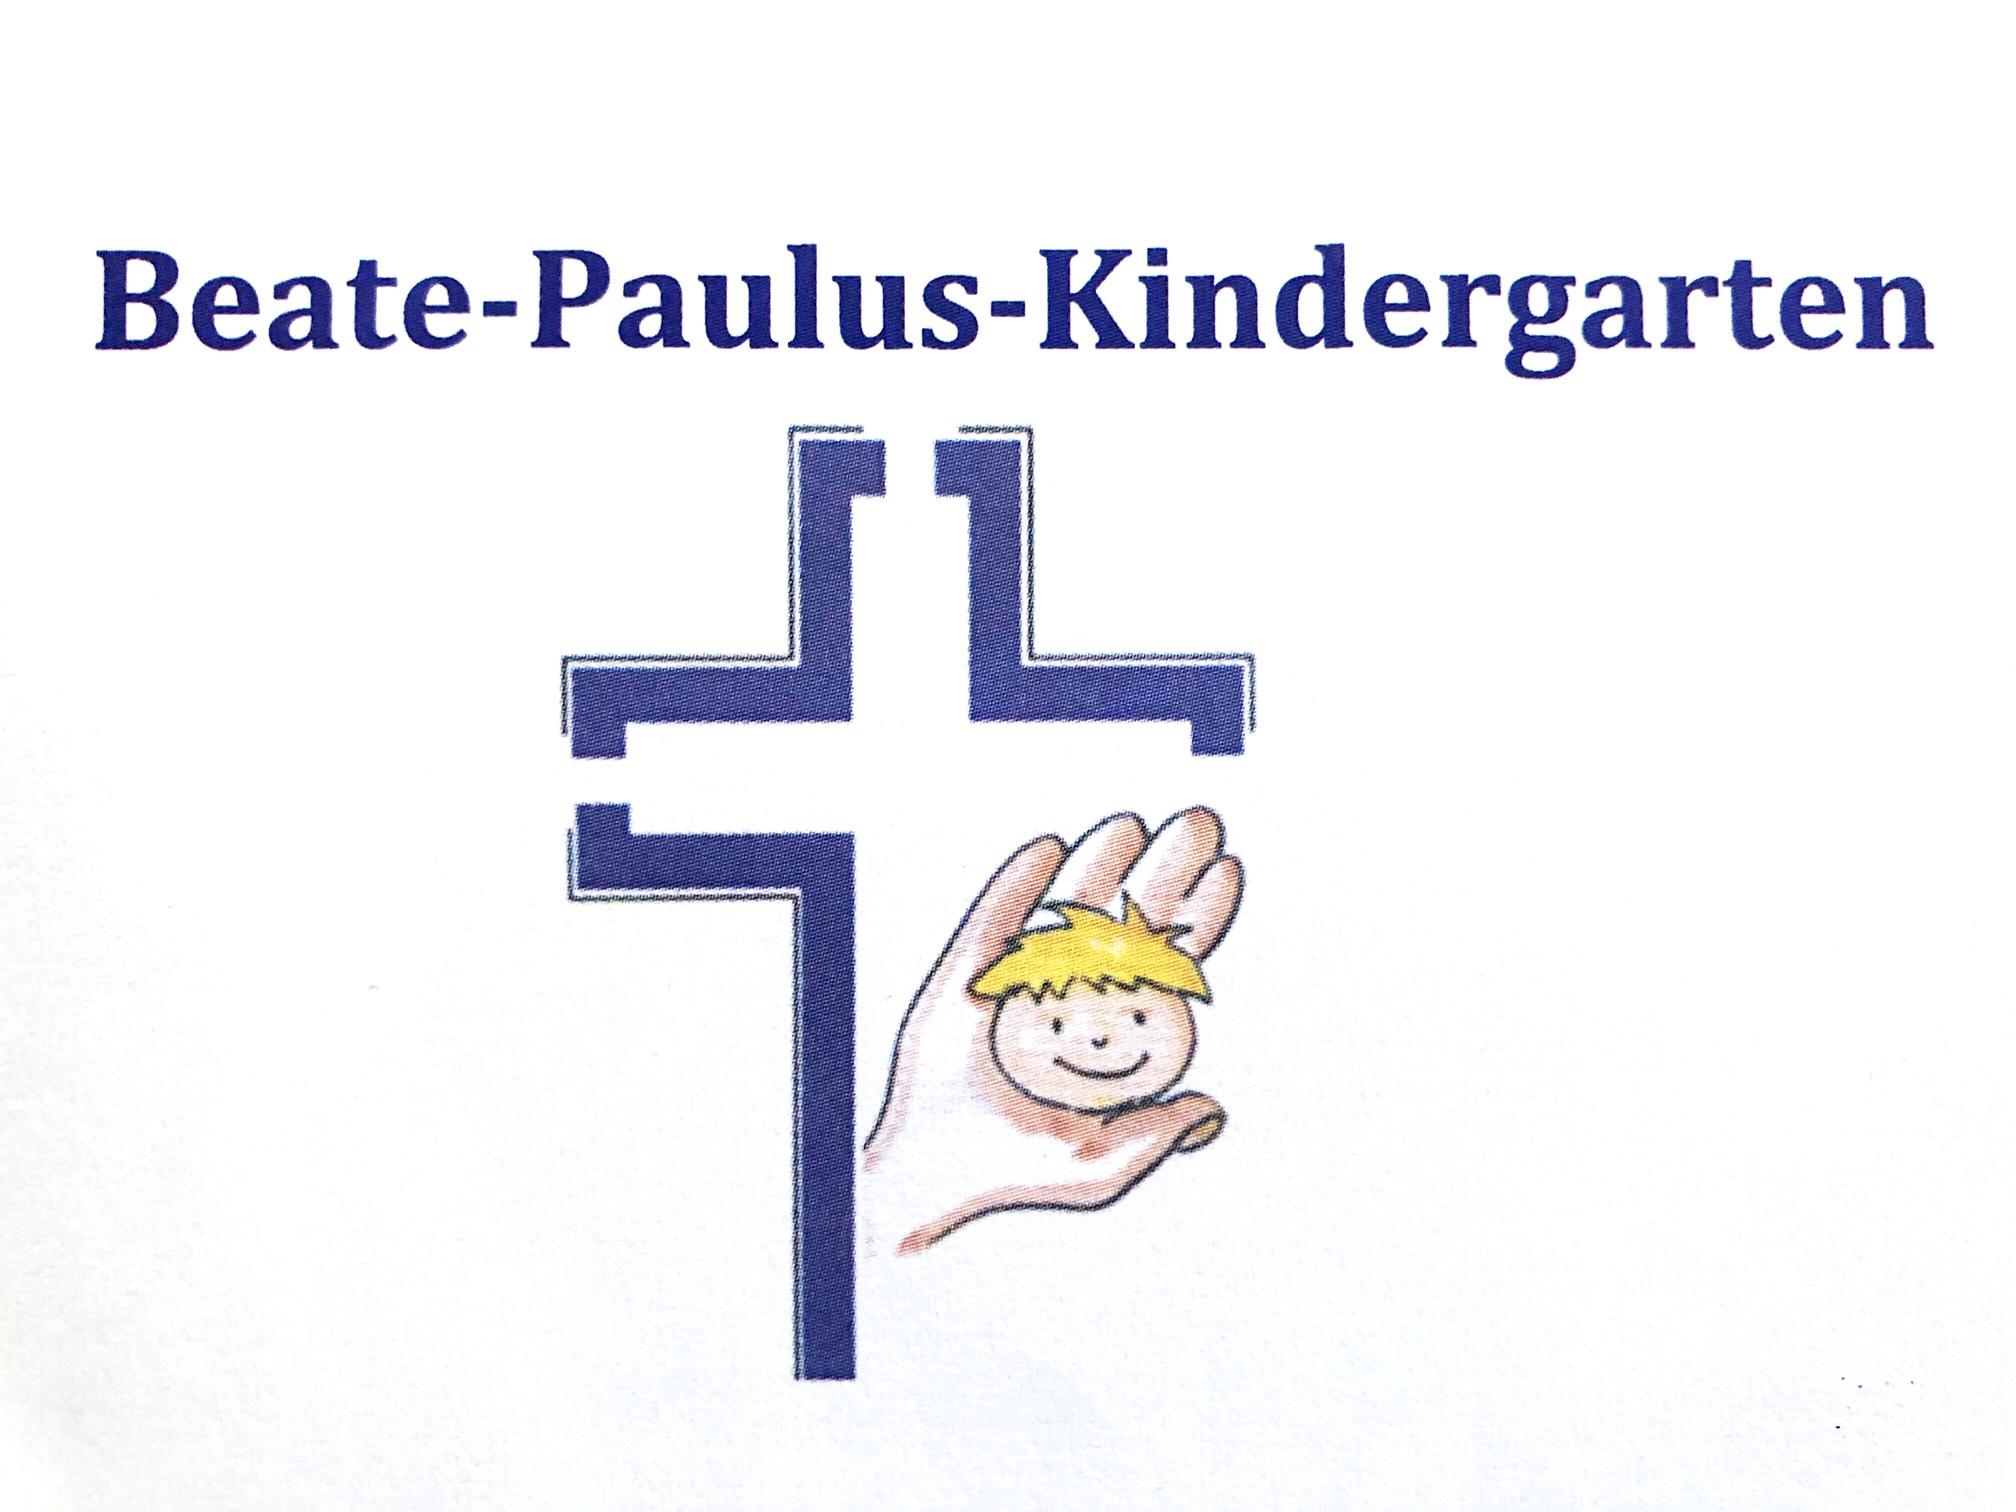 Beate-Paulus Kindergarten